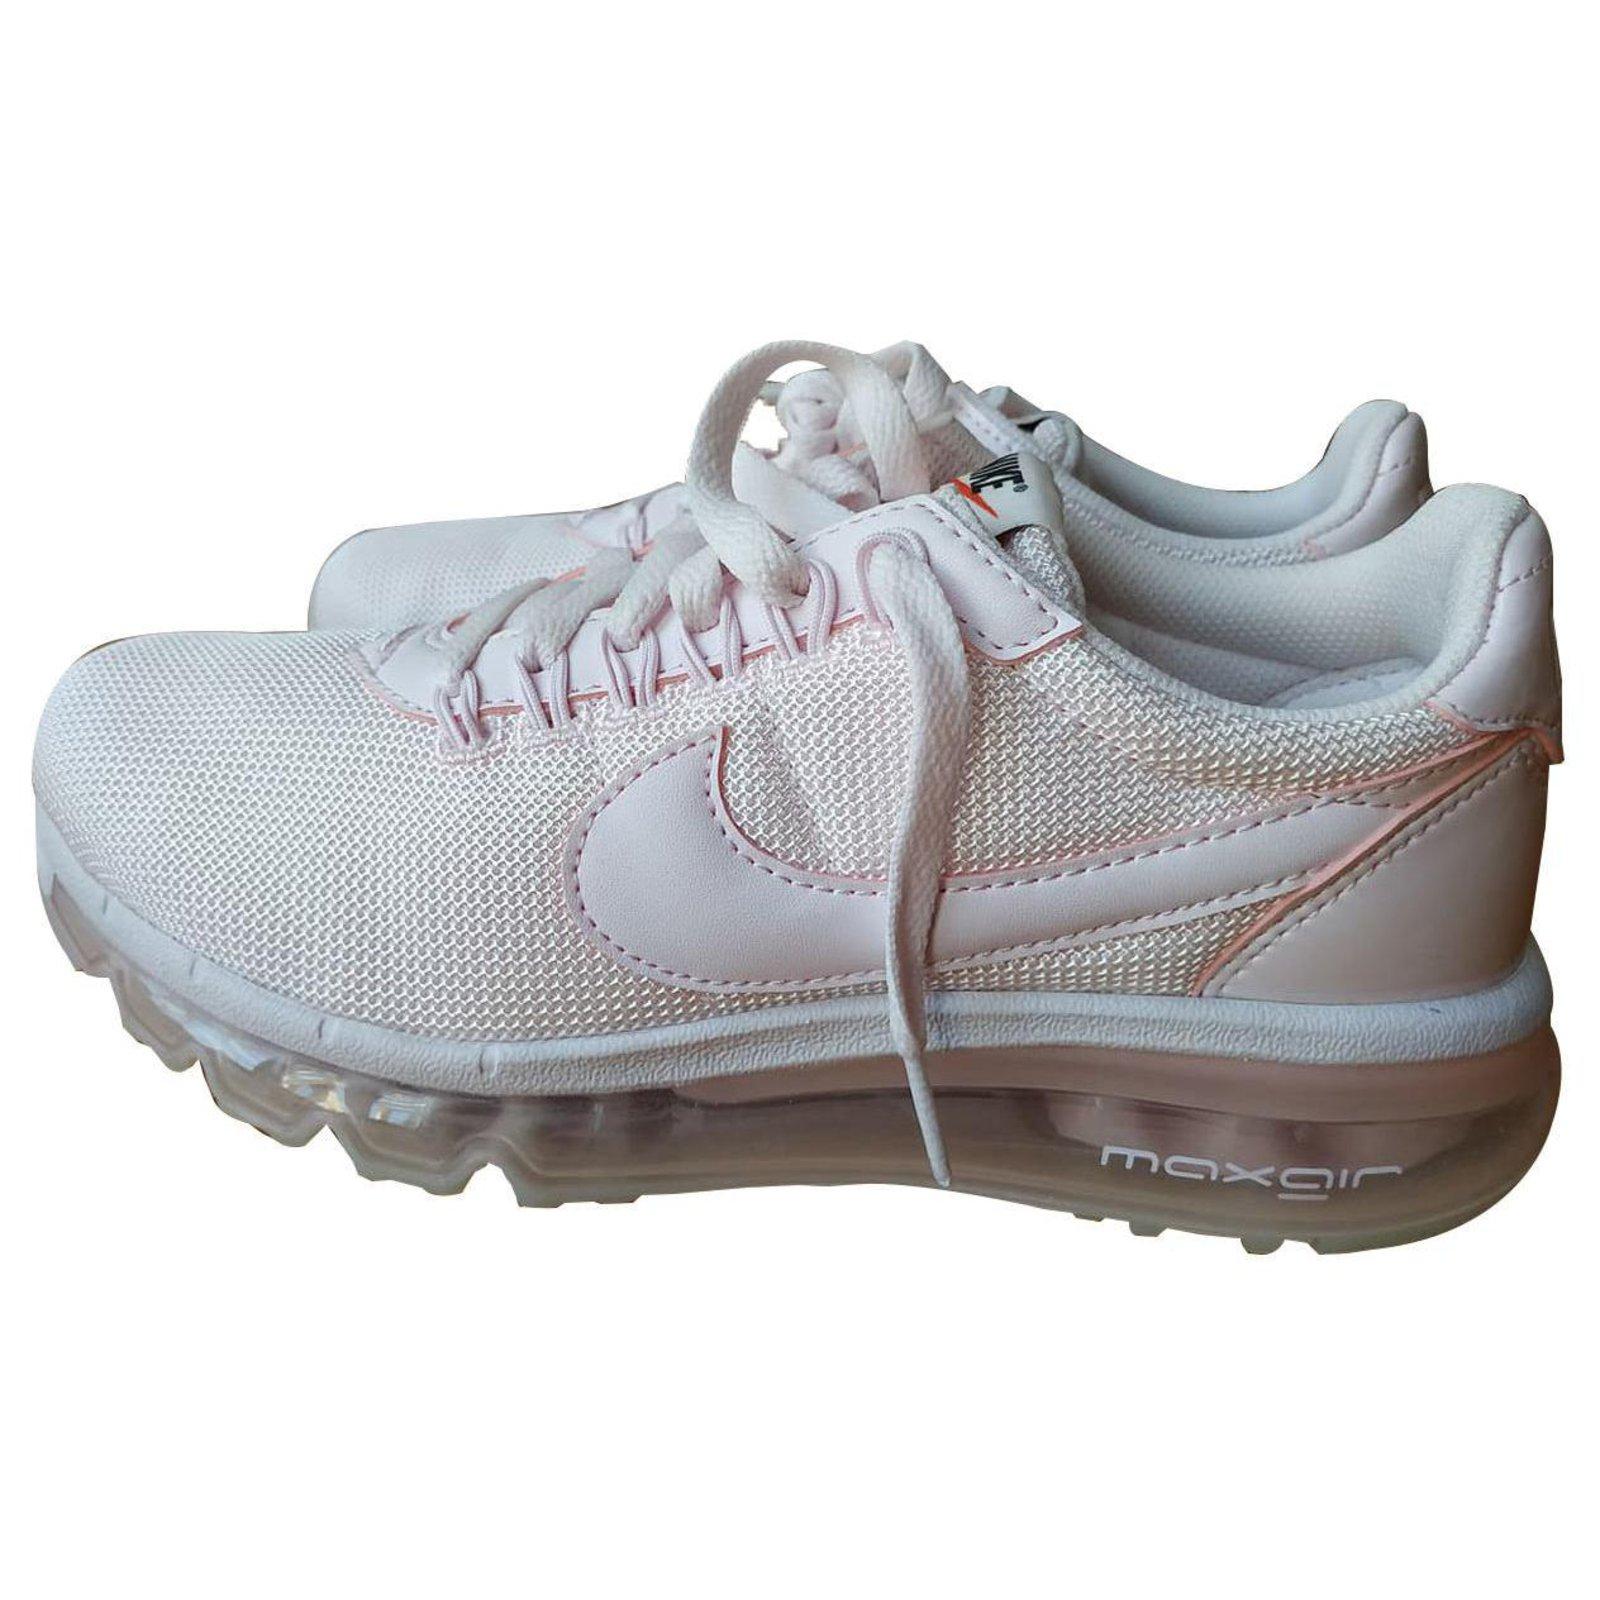 Nike Premium Ld Zero Trainers in Pearl Pink pearl pin